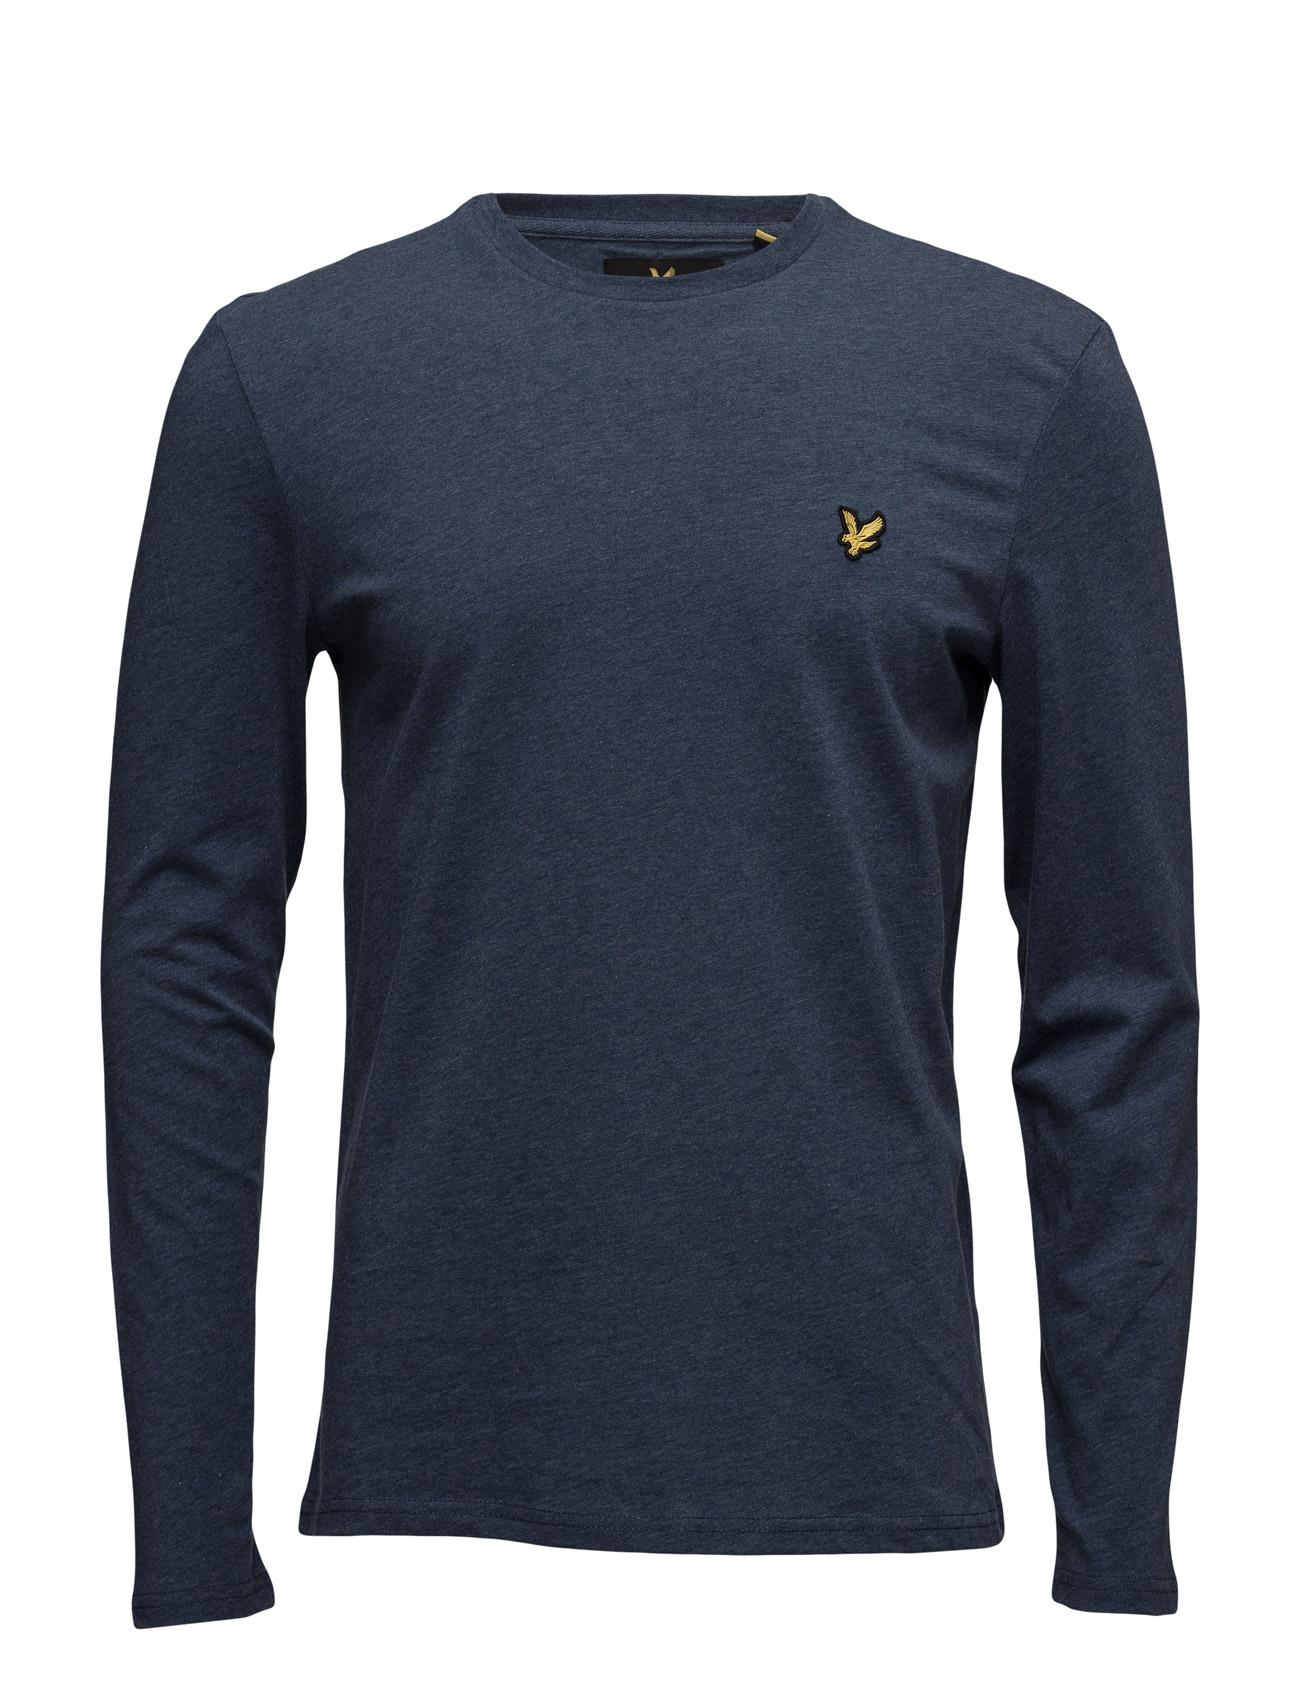 Ls Crew Neck T-Shirt Lyle & Scott T-shirts til Mænd i